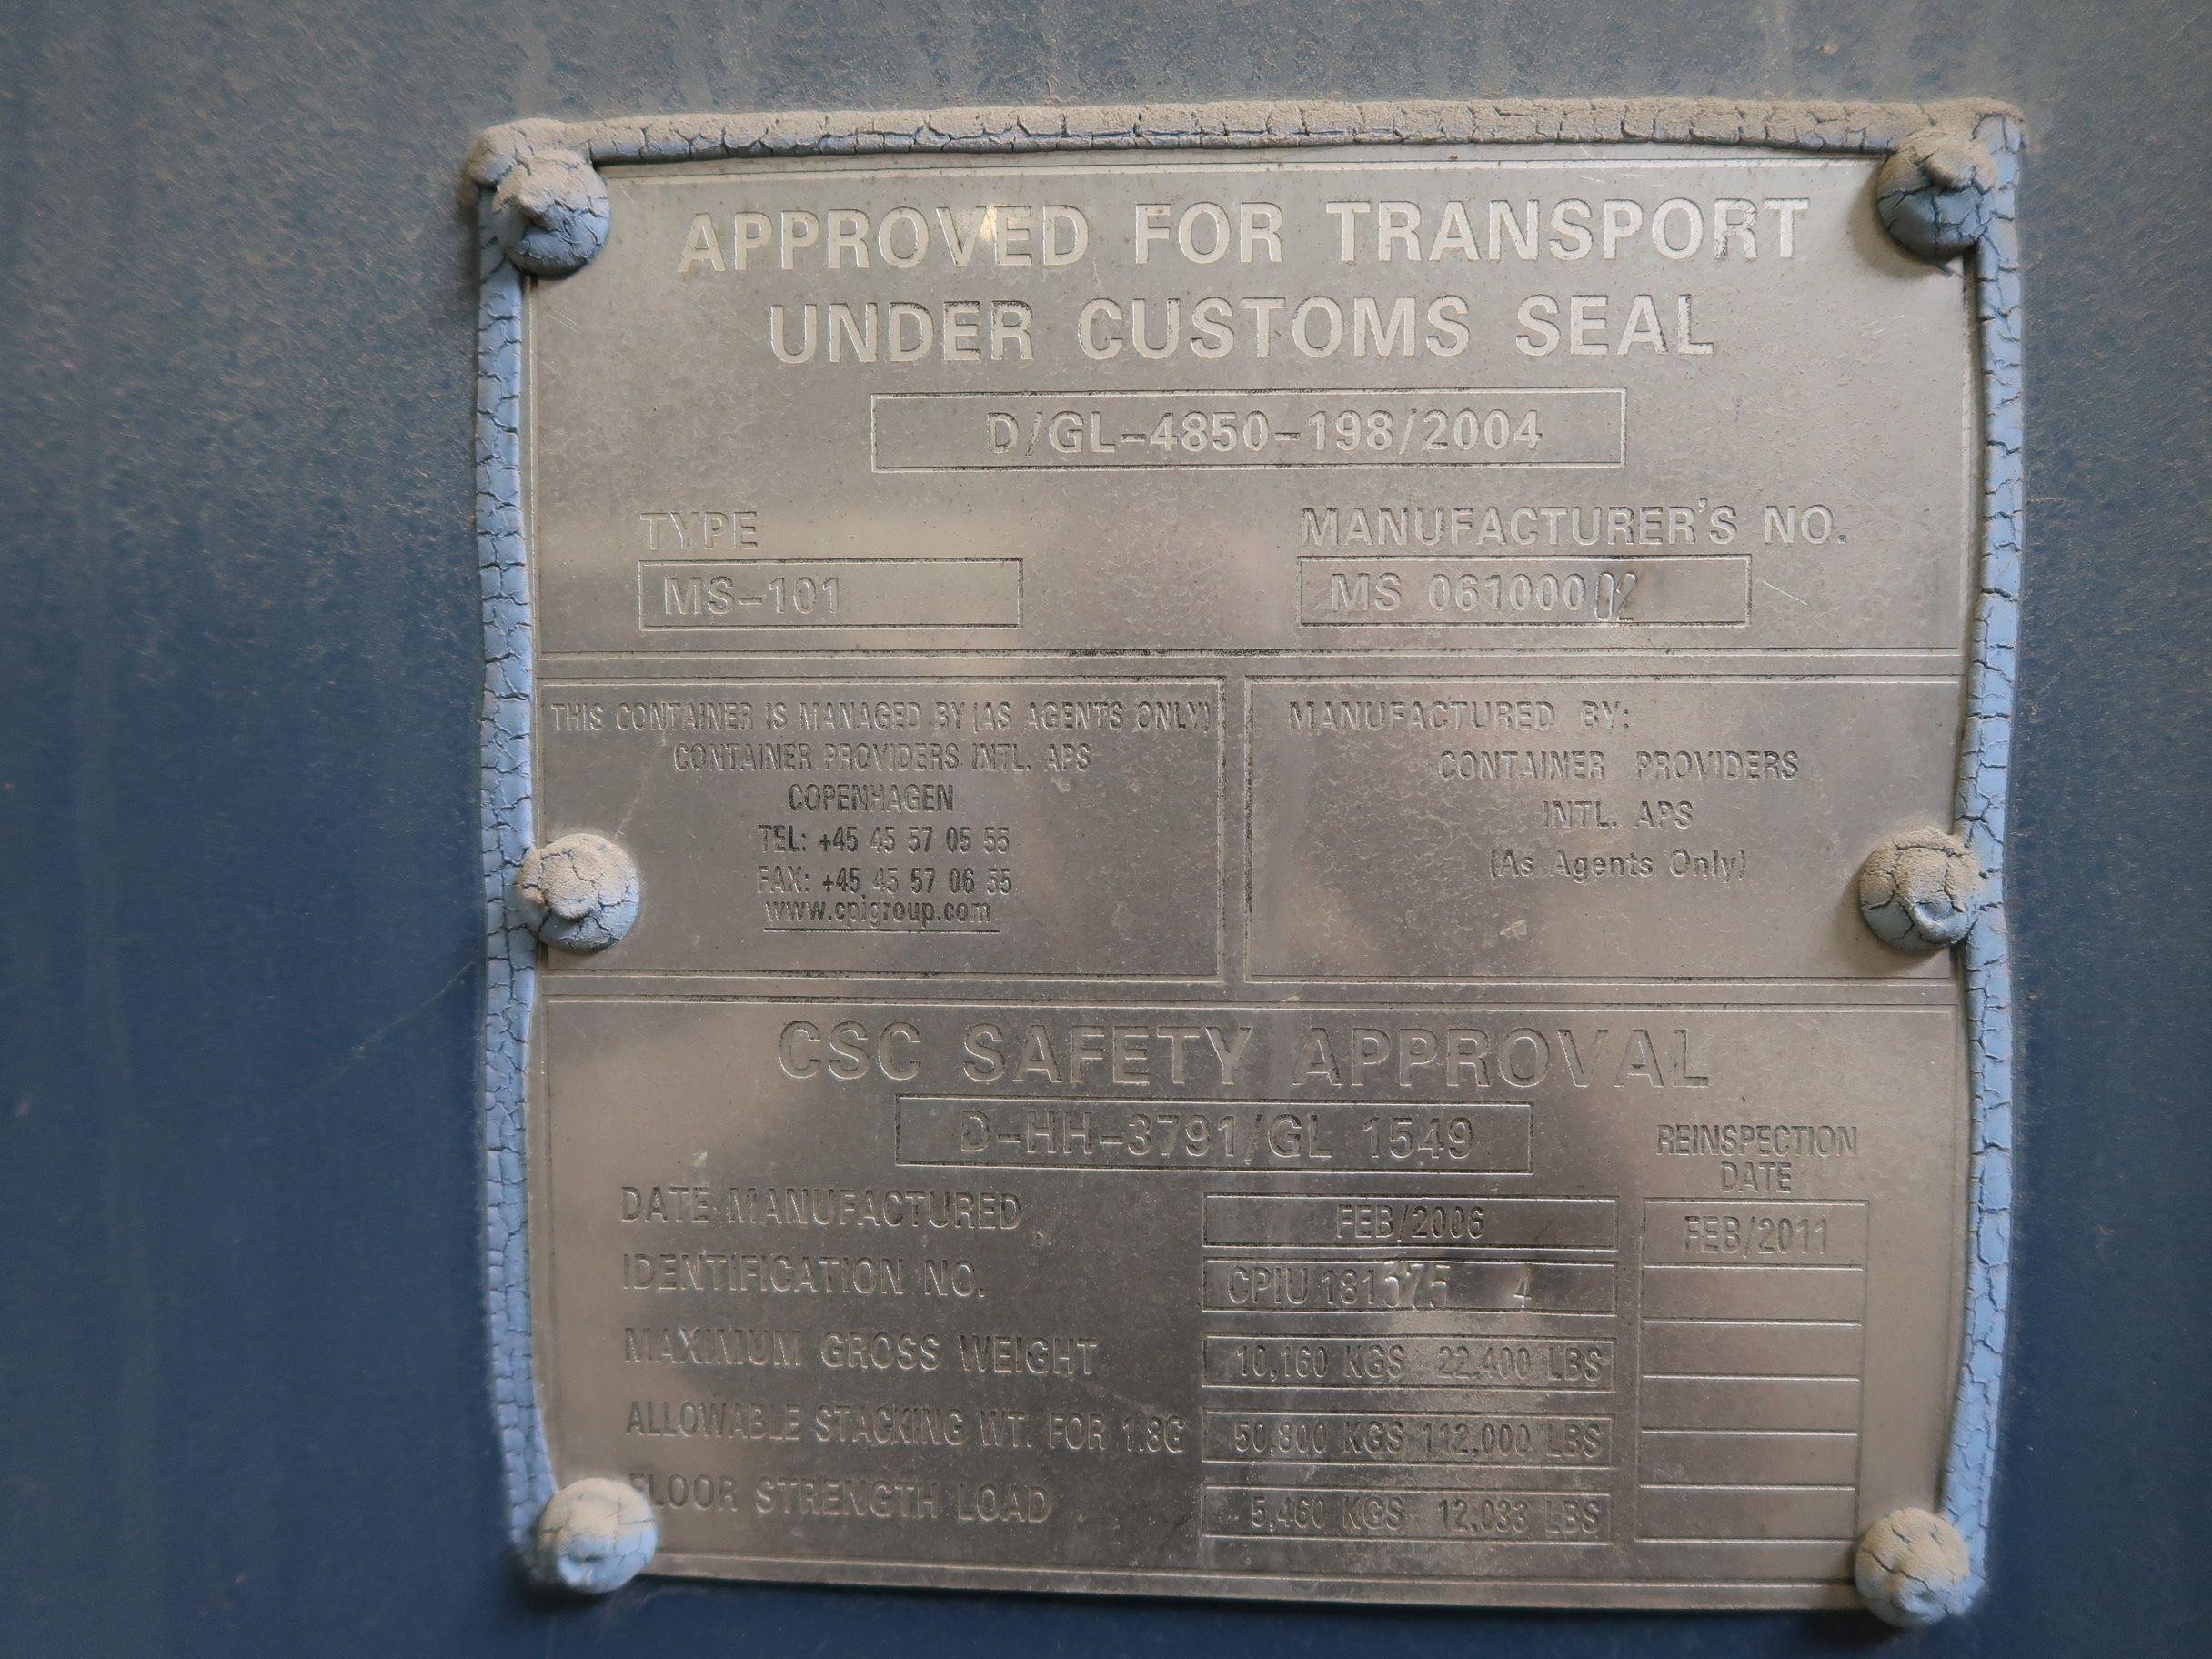 8' X 8' CONTAINER PROVIDER INTL CONEX STORAGE CONATINER WITH STANDARD END DOOR, 561 CU. FT. - Image 2 of 2